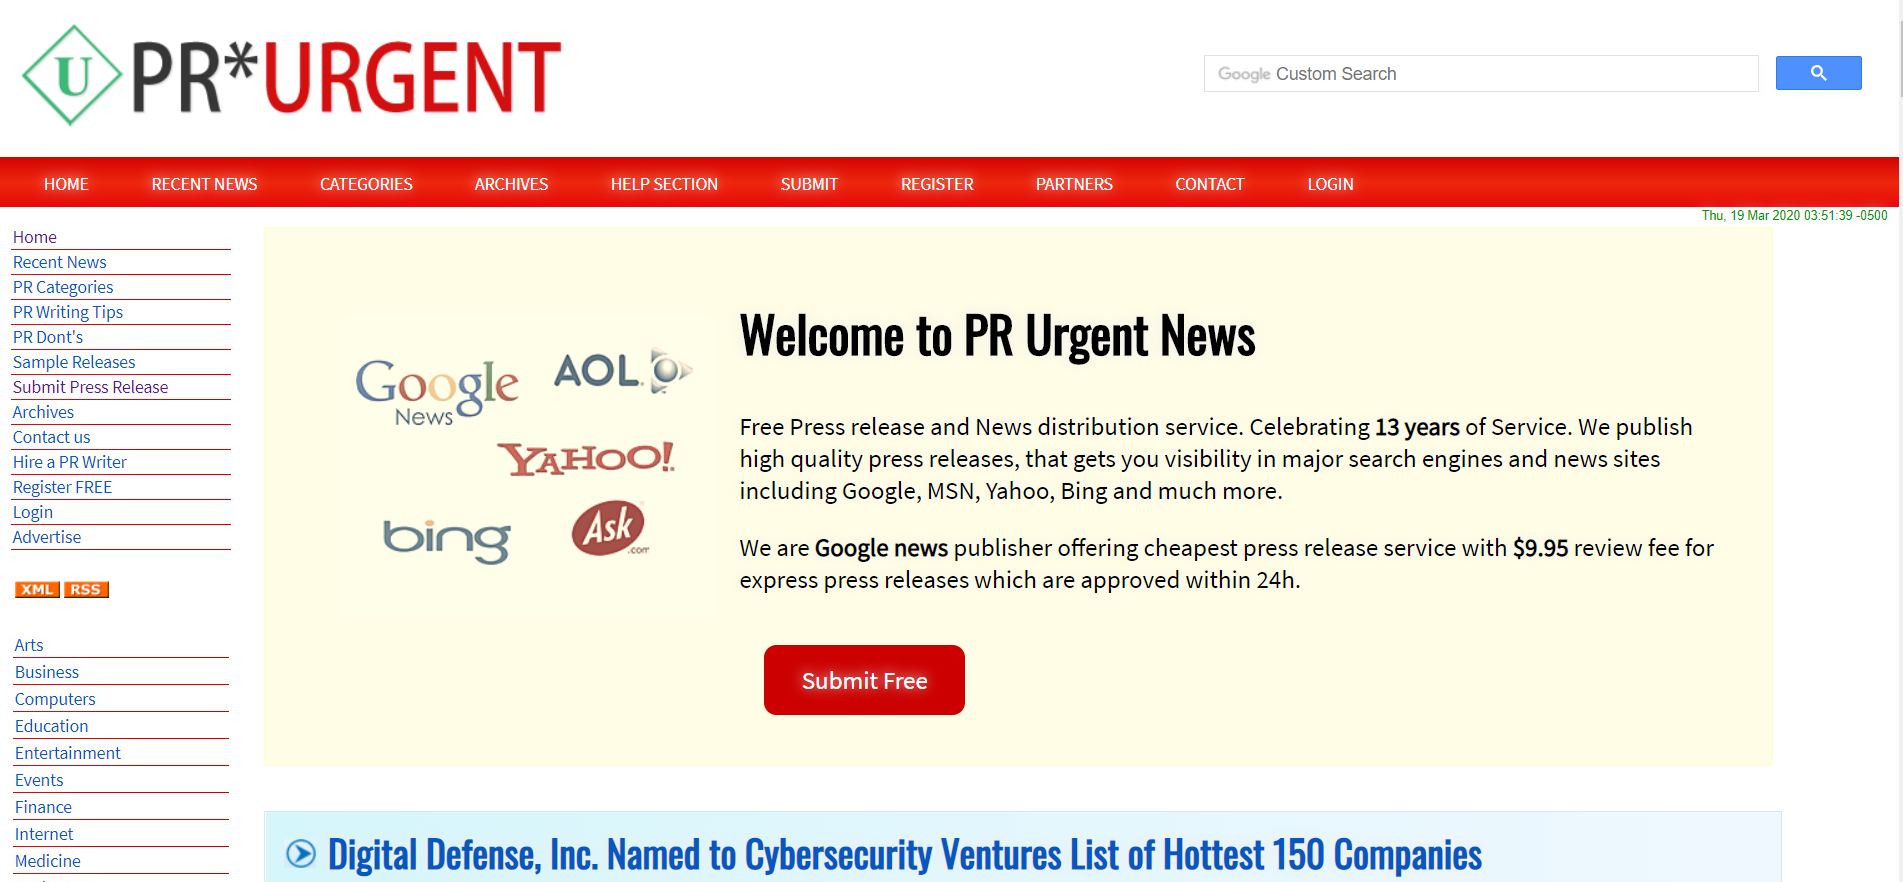 prurgent-press-release-site